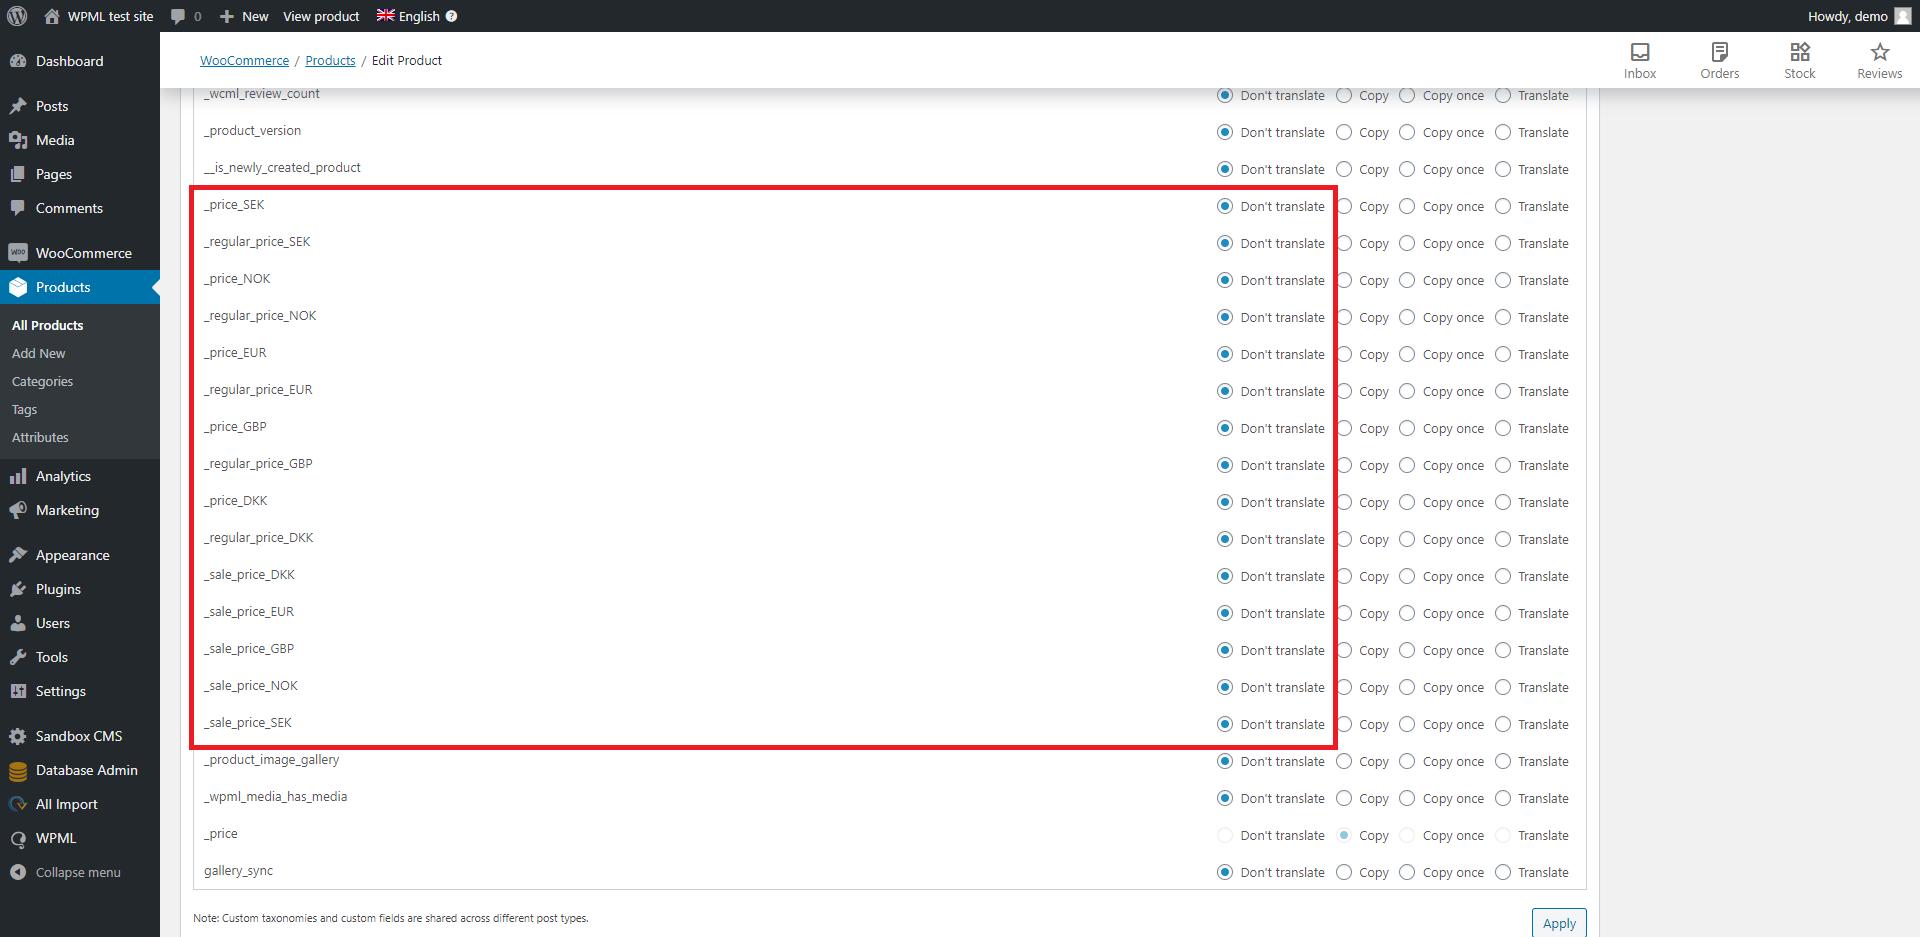 FireShot Capture 1022 - Edit product ‹ WPML test site — WordPress_ - funny-racoon-rtmolbvq.sandboxcms.com.png